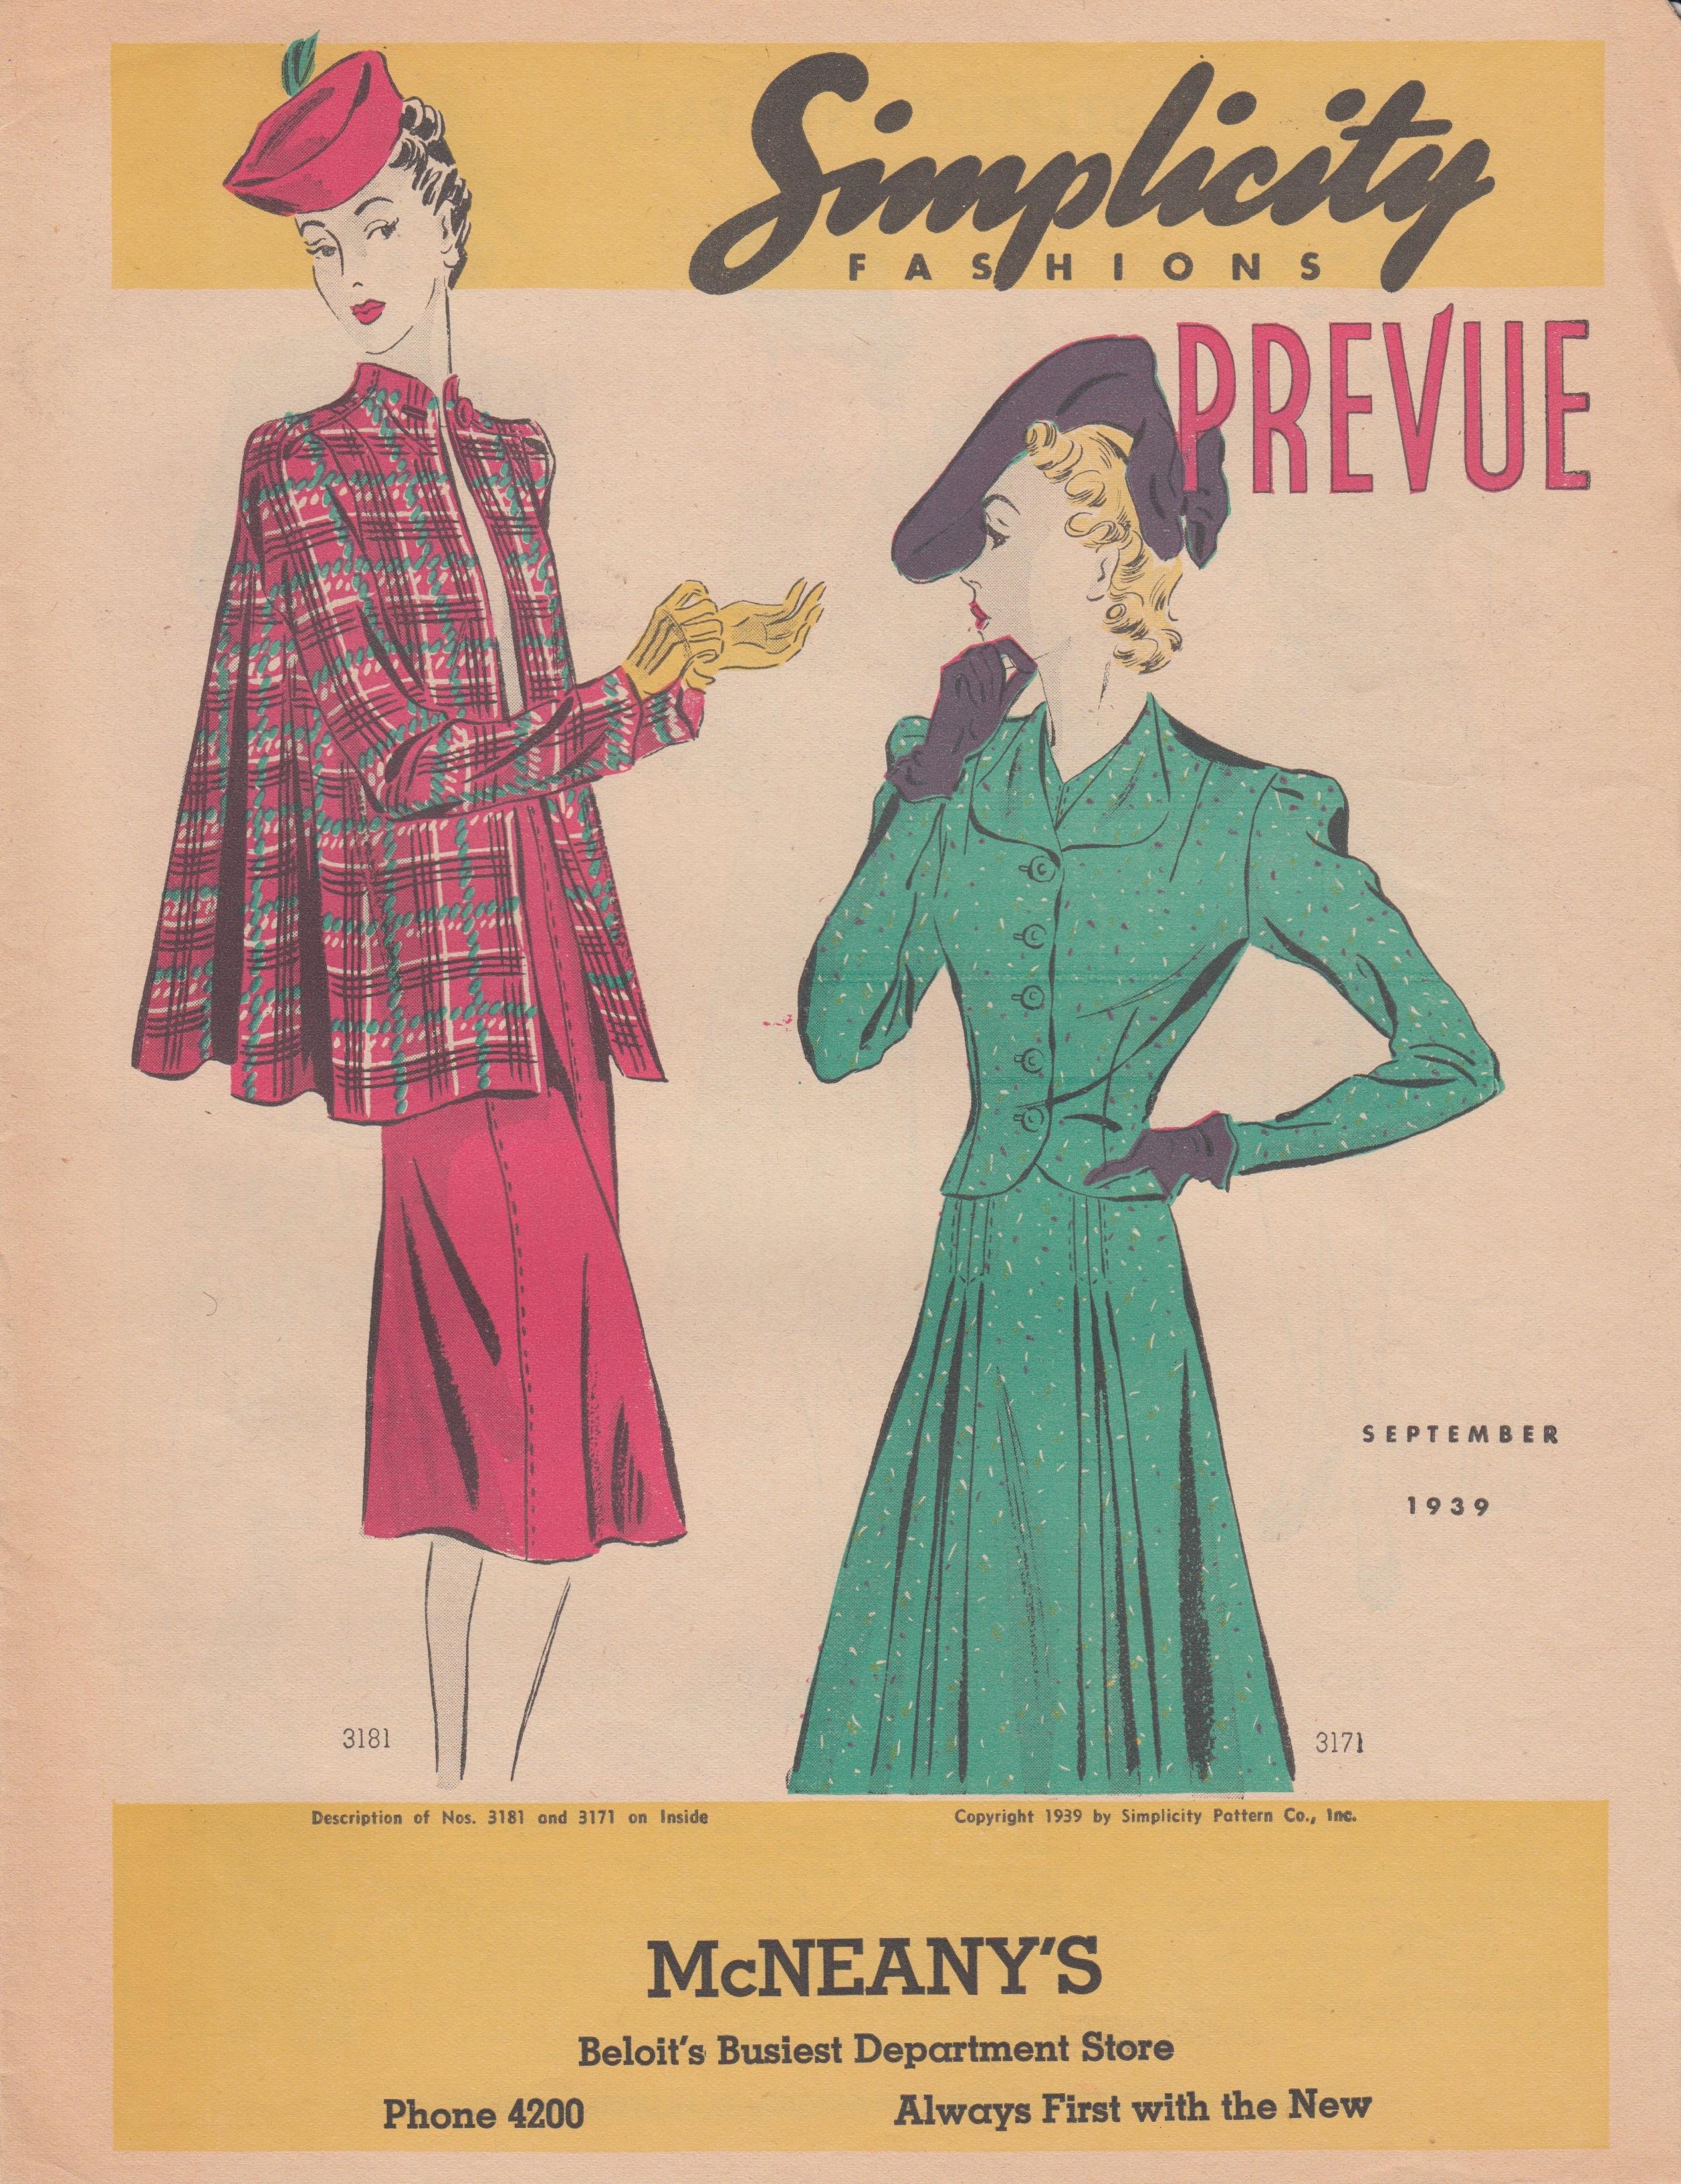 Simplicity Prevue September 1939